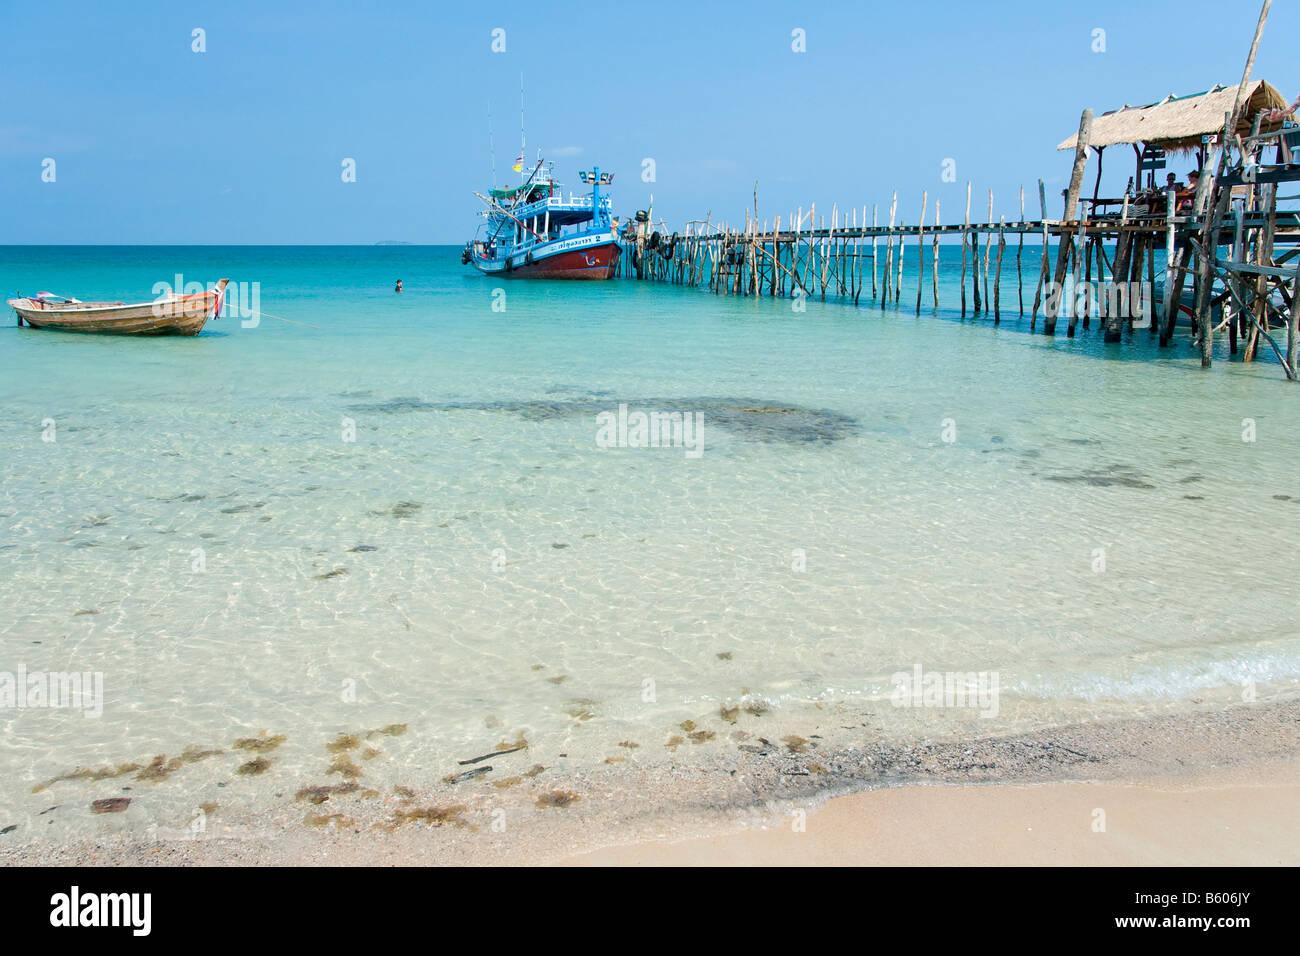 Koh Chang Thailand Asia harbour catwalk bridge - Stock Image